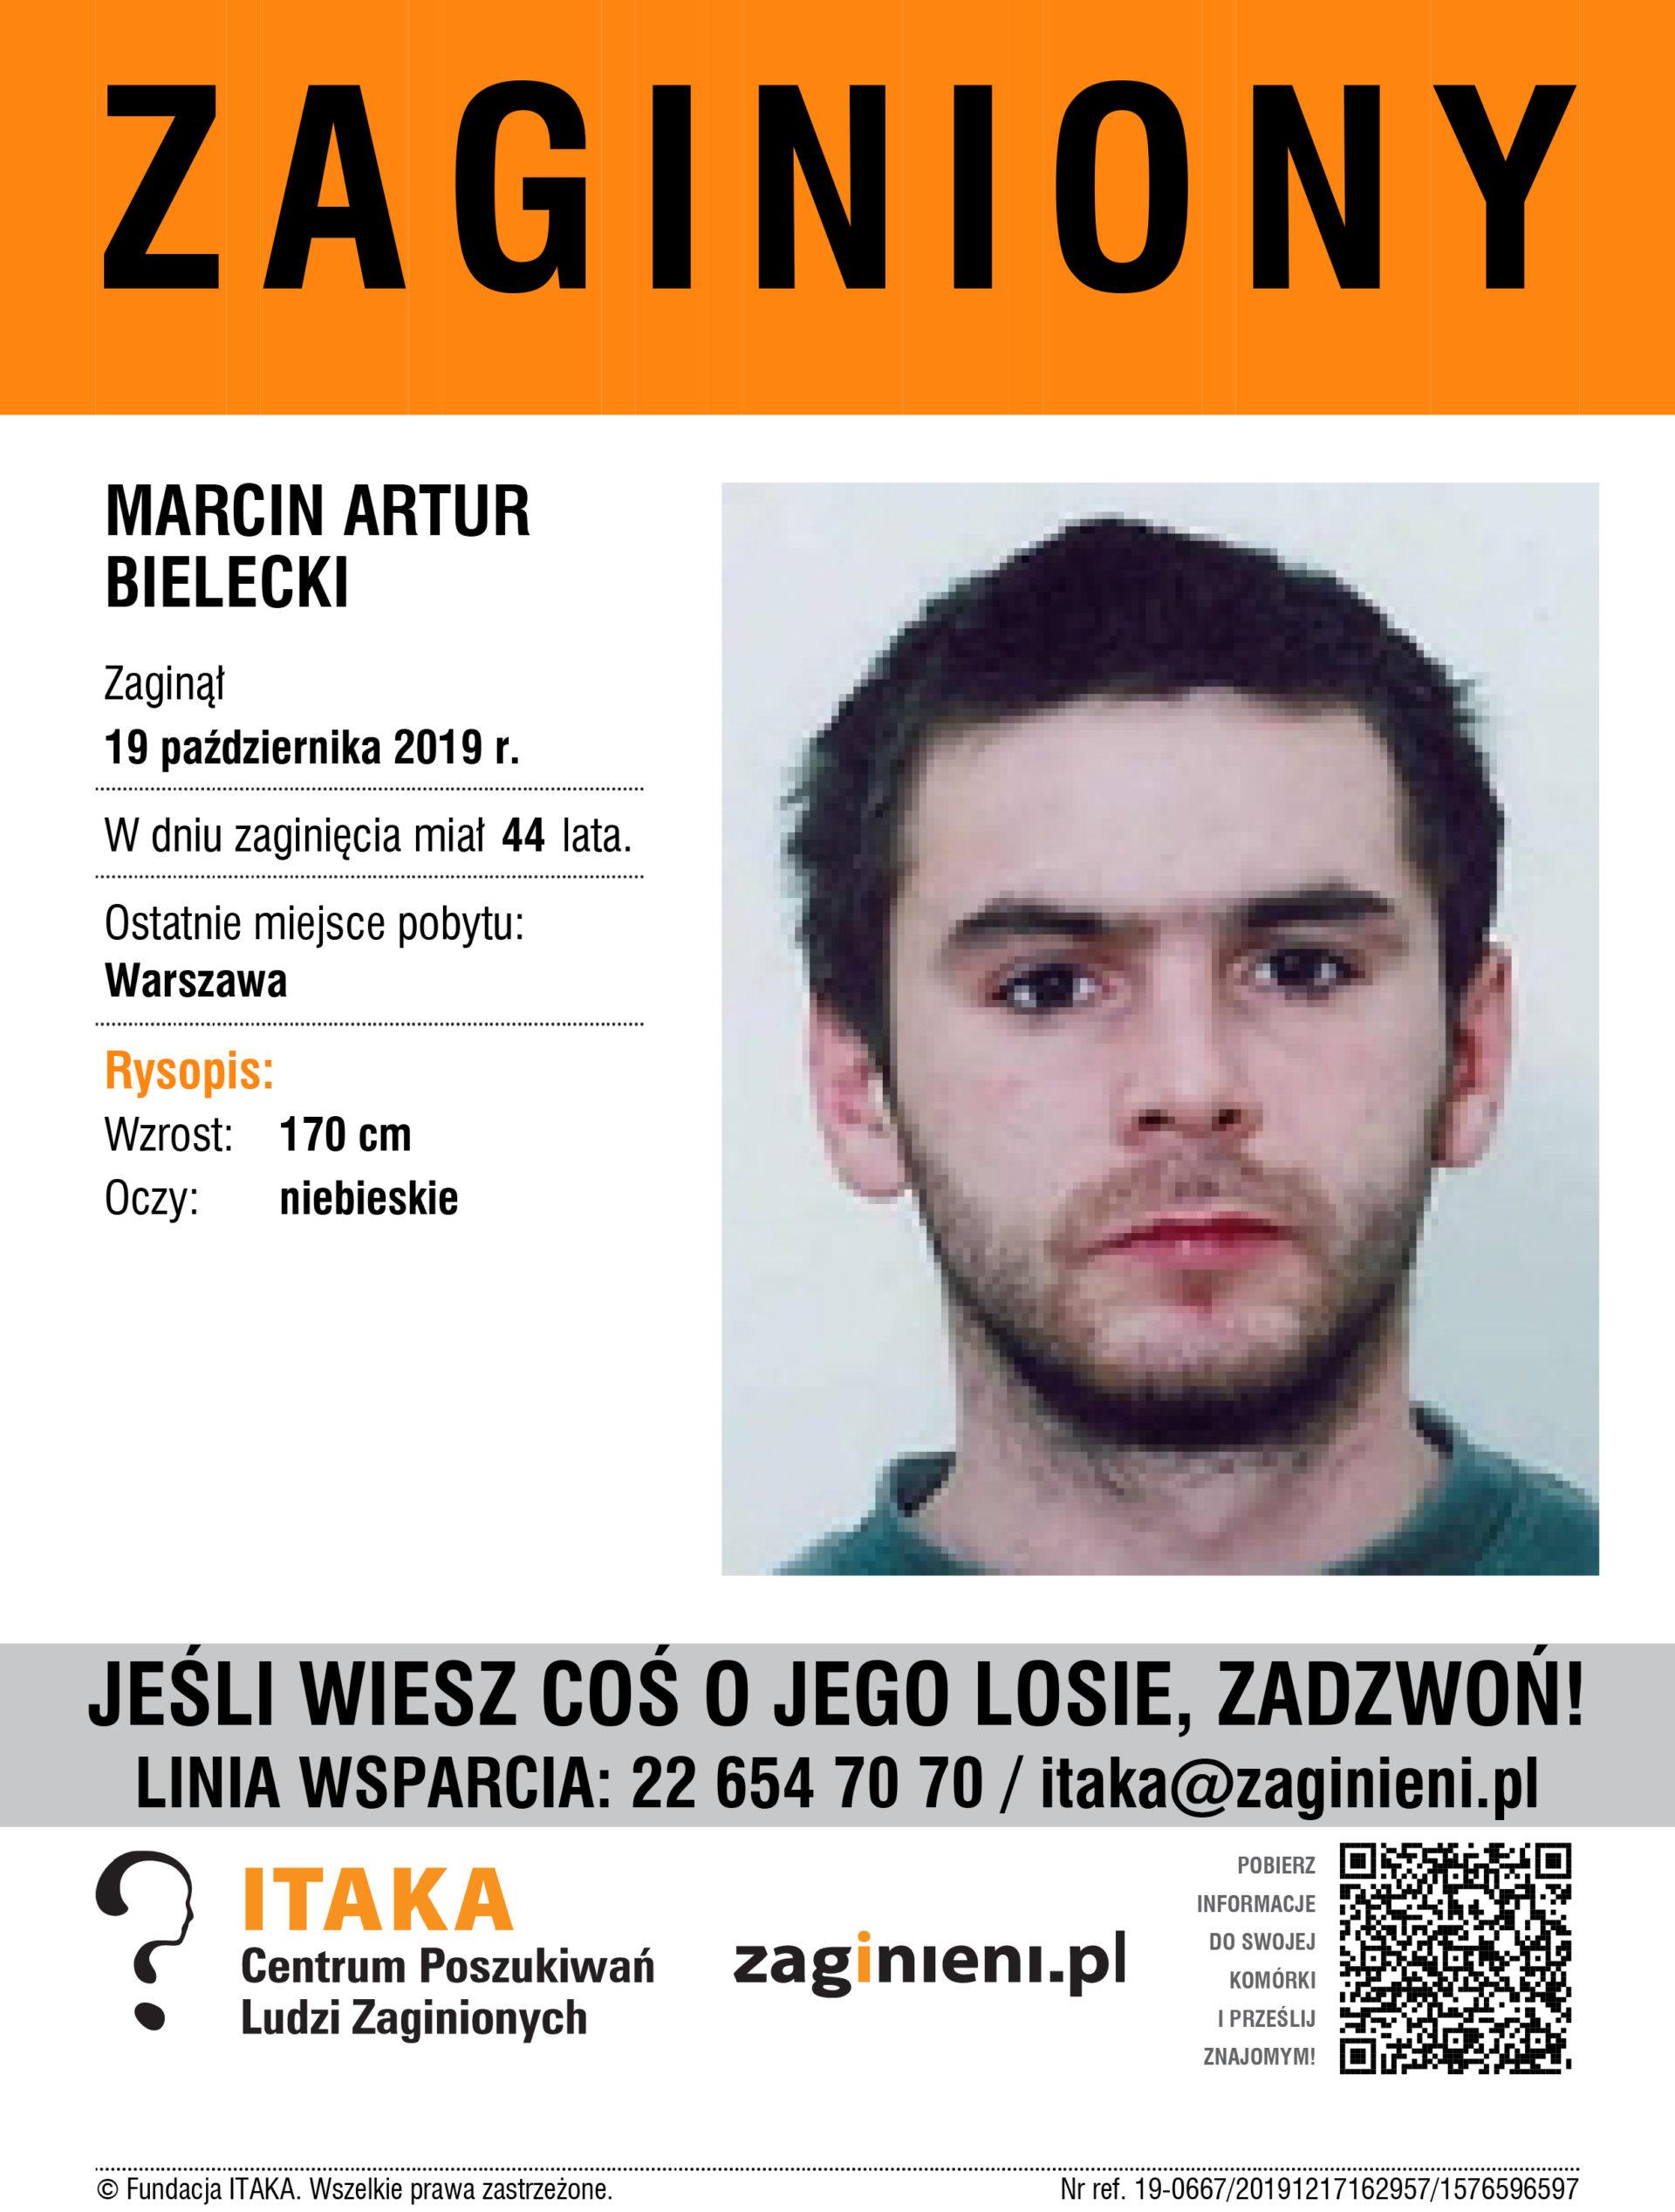 Marcin Artur Bielecki